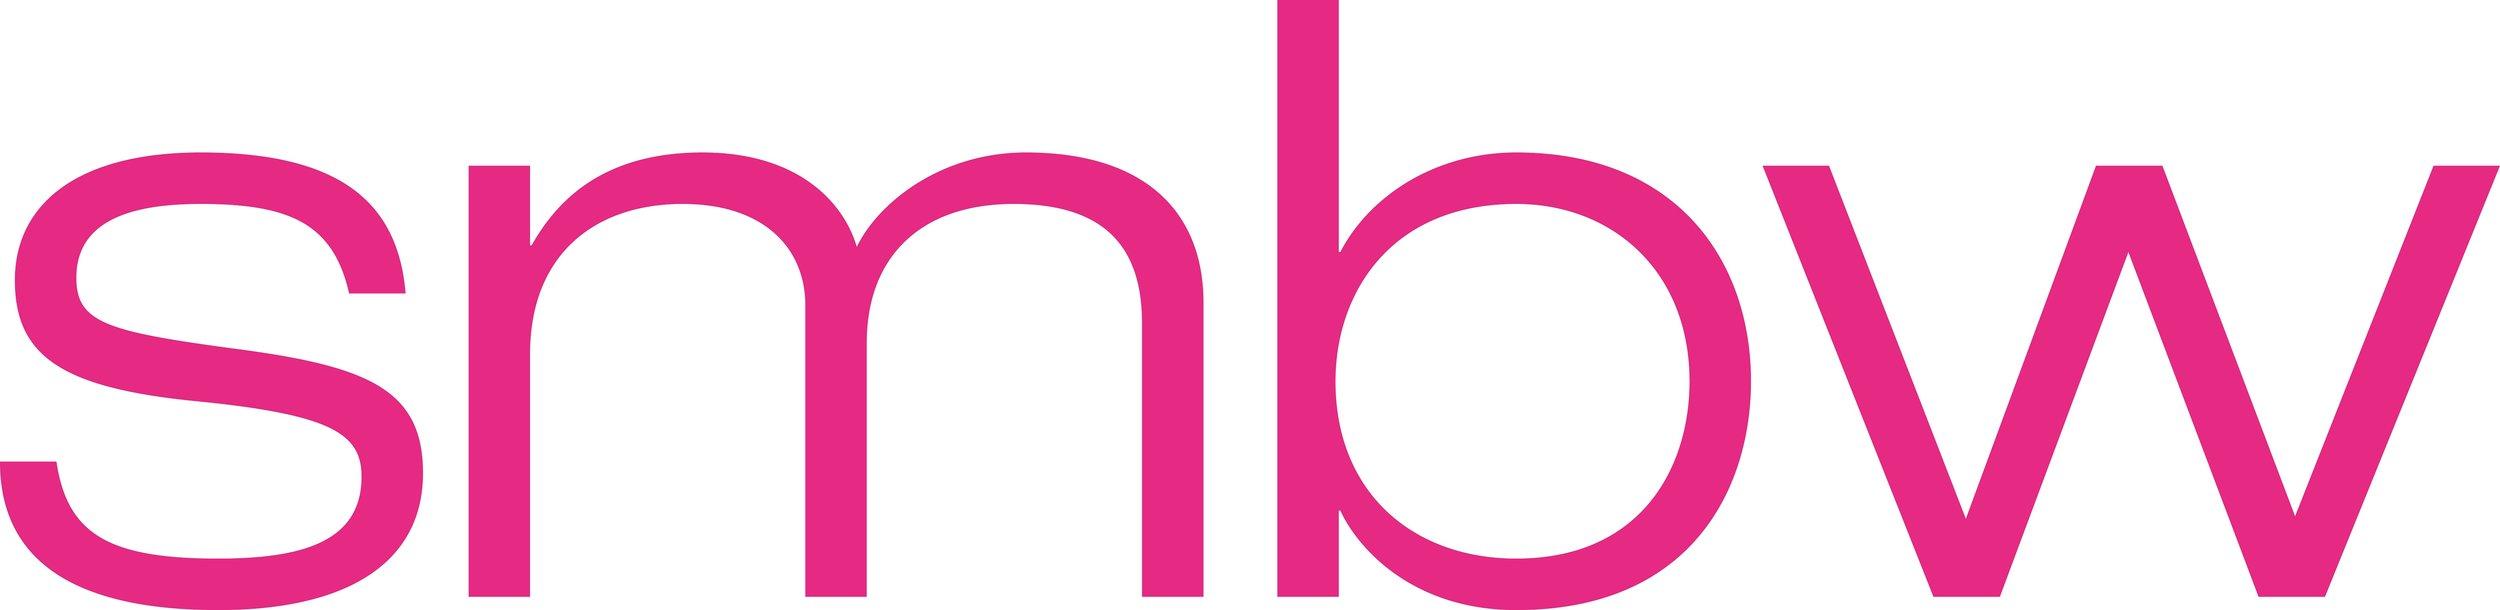 smbw-architects-logo-small.jpg